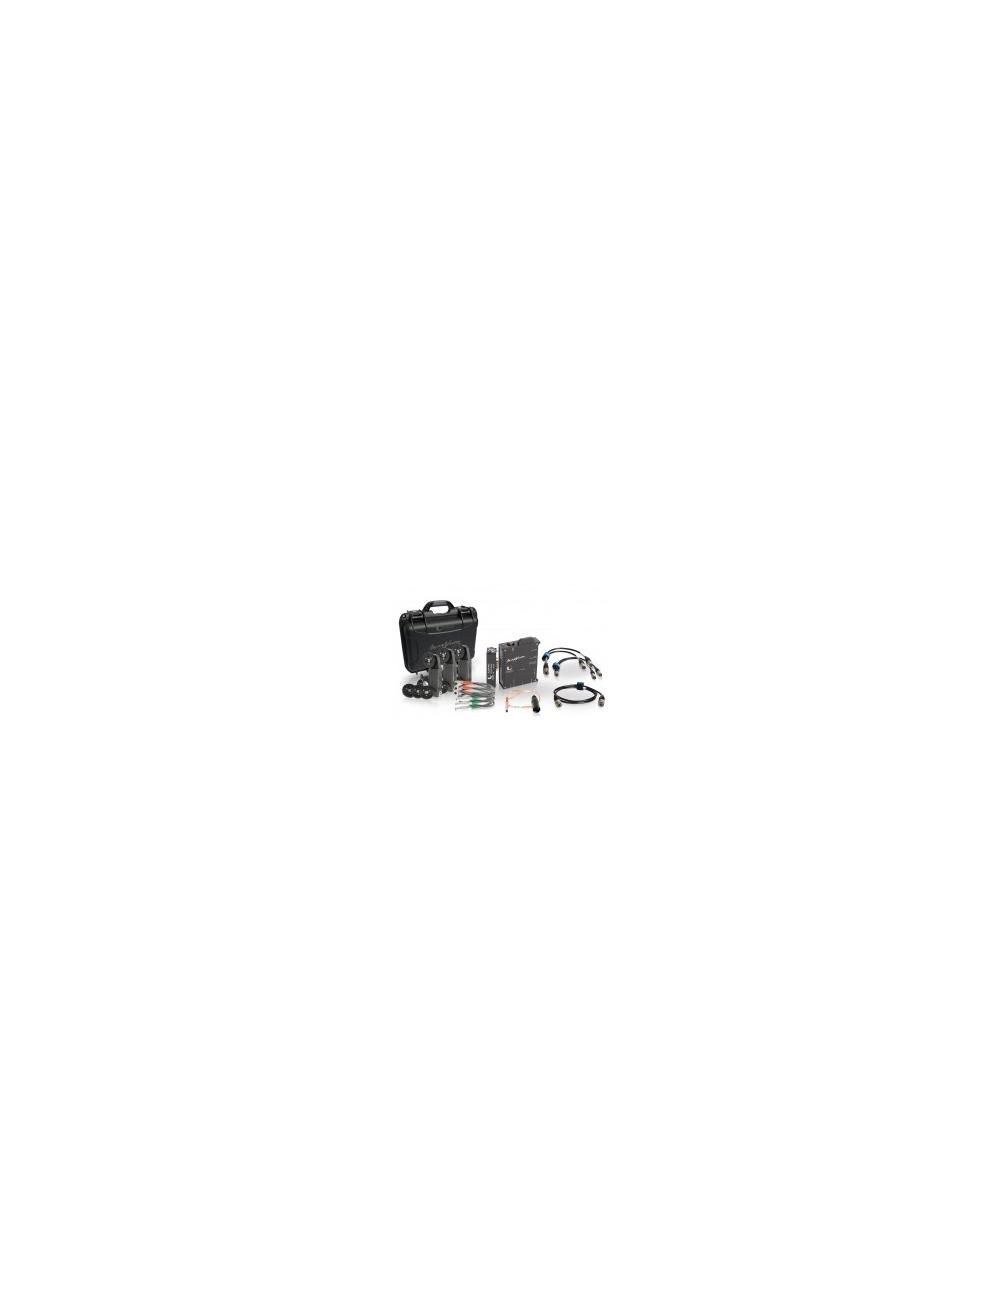 Chrosziel - Control inalámbrico MagNum (motor Hedén) foco/iris/zoom MN-300KIT-BC-H